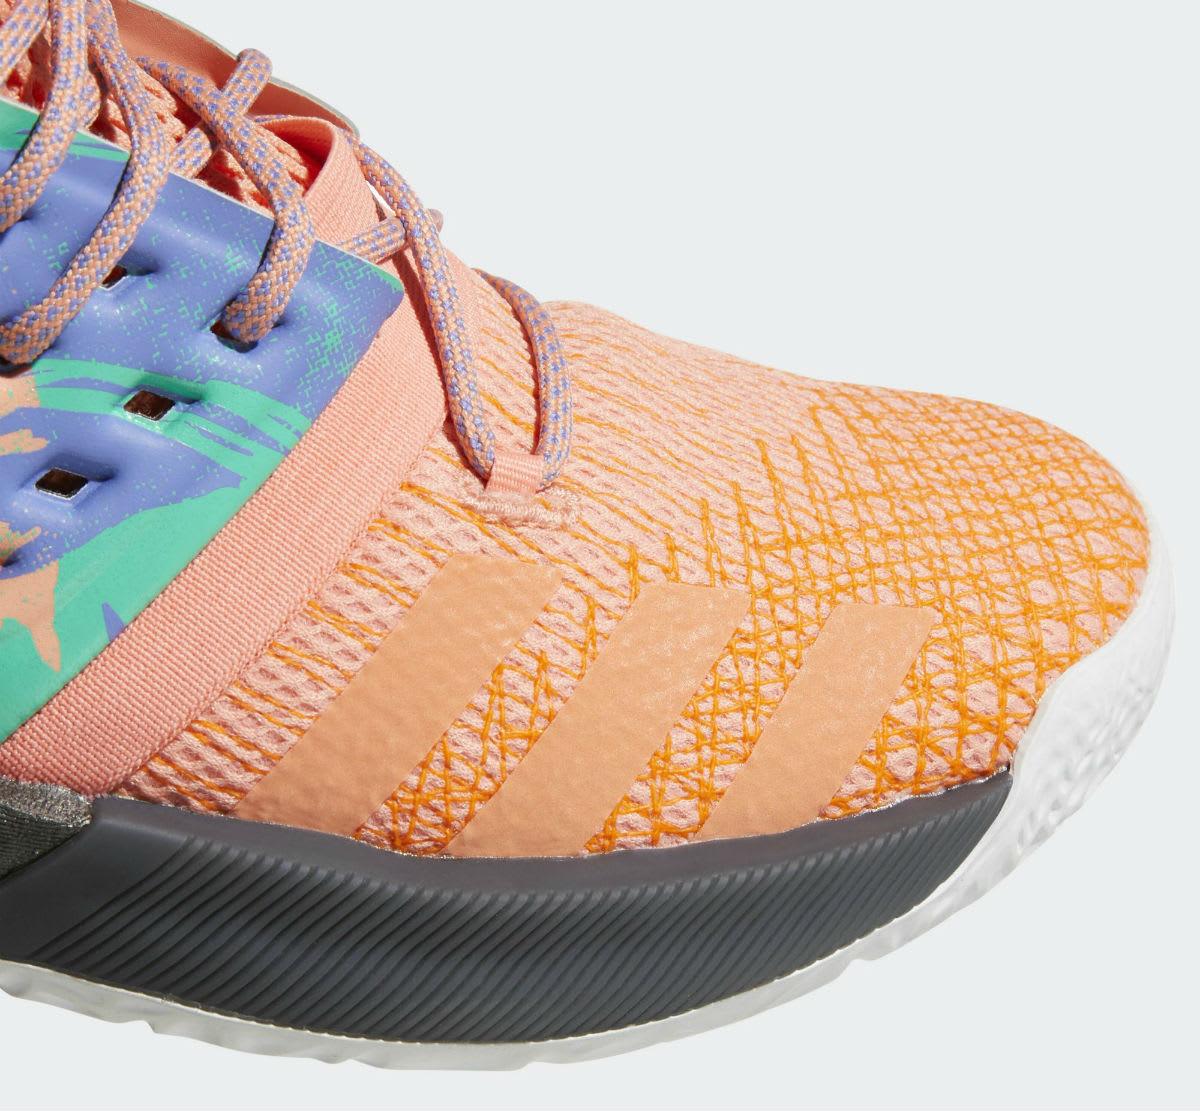 Adidas Harden Vol. 2 Orange Release Date AH2219 Toe